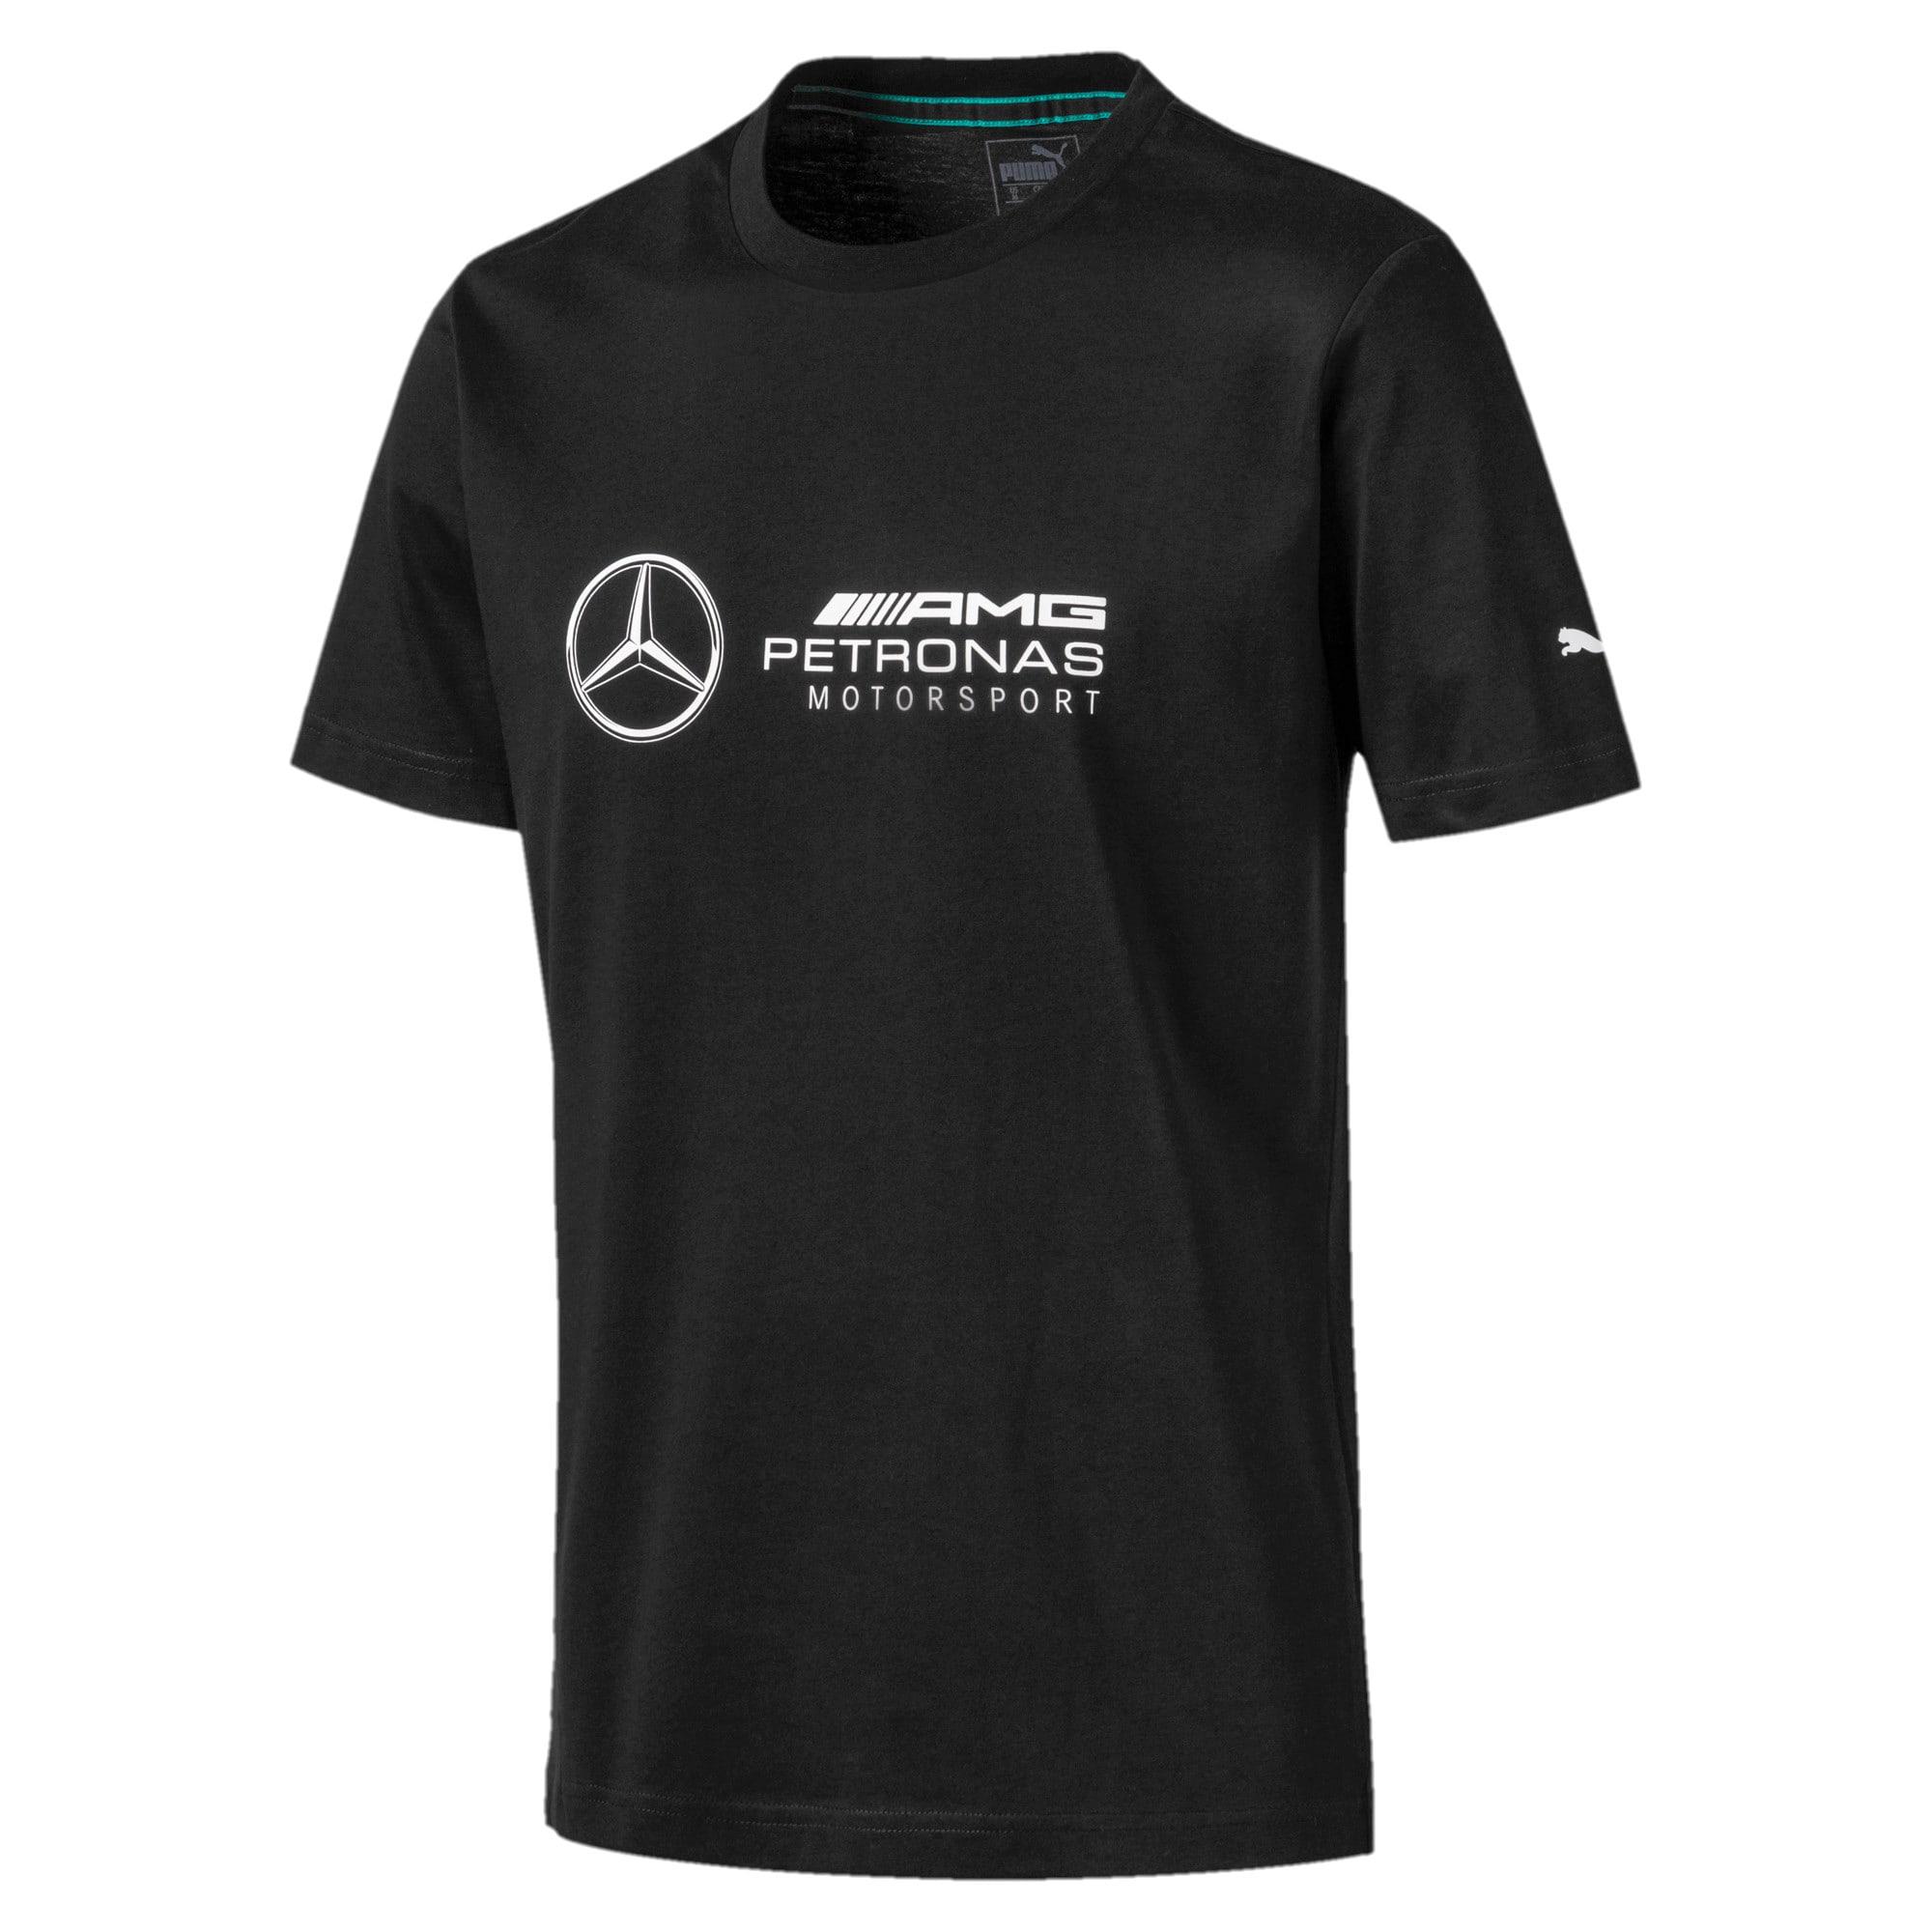 Thumbnail 4 of Mercedes AMG Petronas T-shirt met korte mouwen voor heren, Puma Black, medium